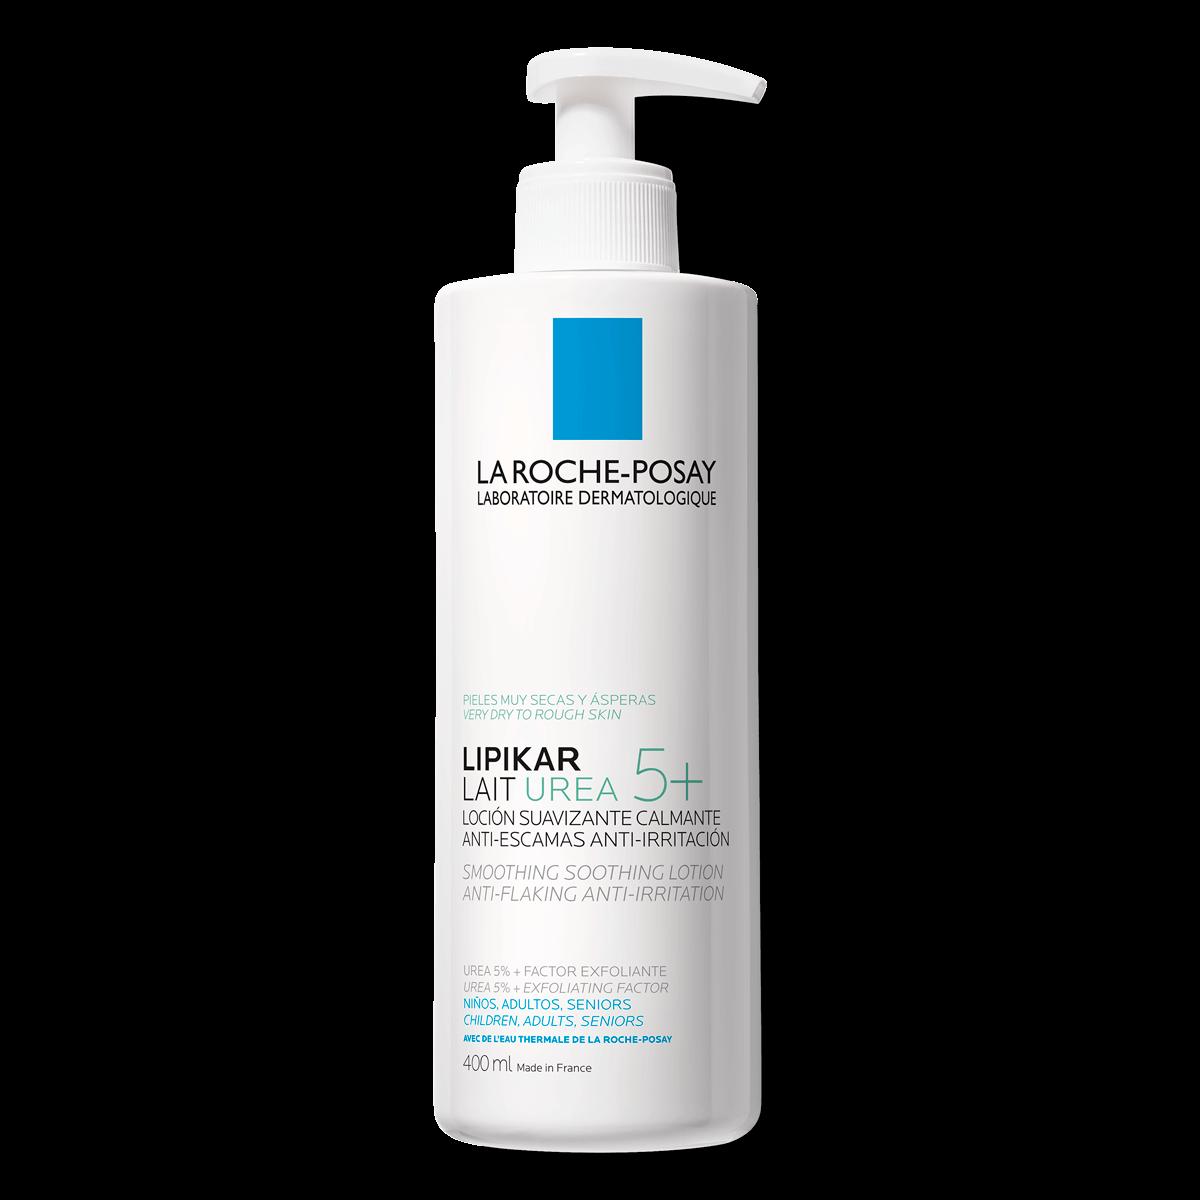 lipikar lait urea 5+ 400ml loção calmante anti-irritação